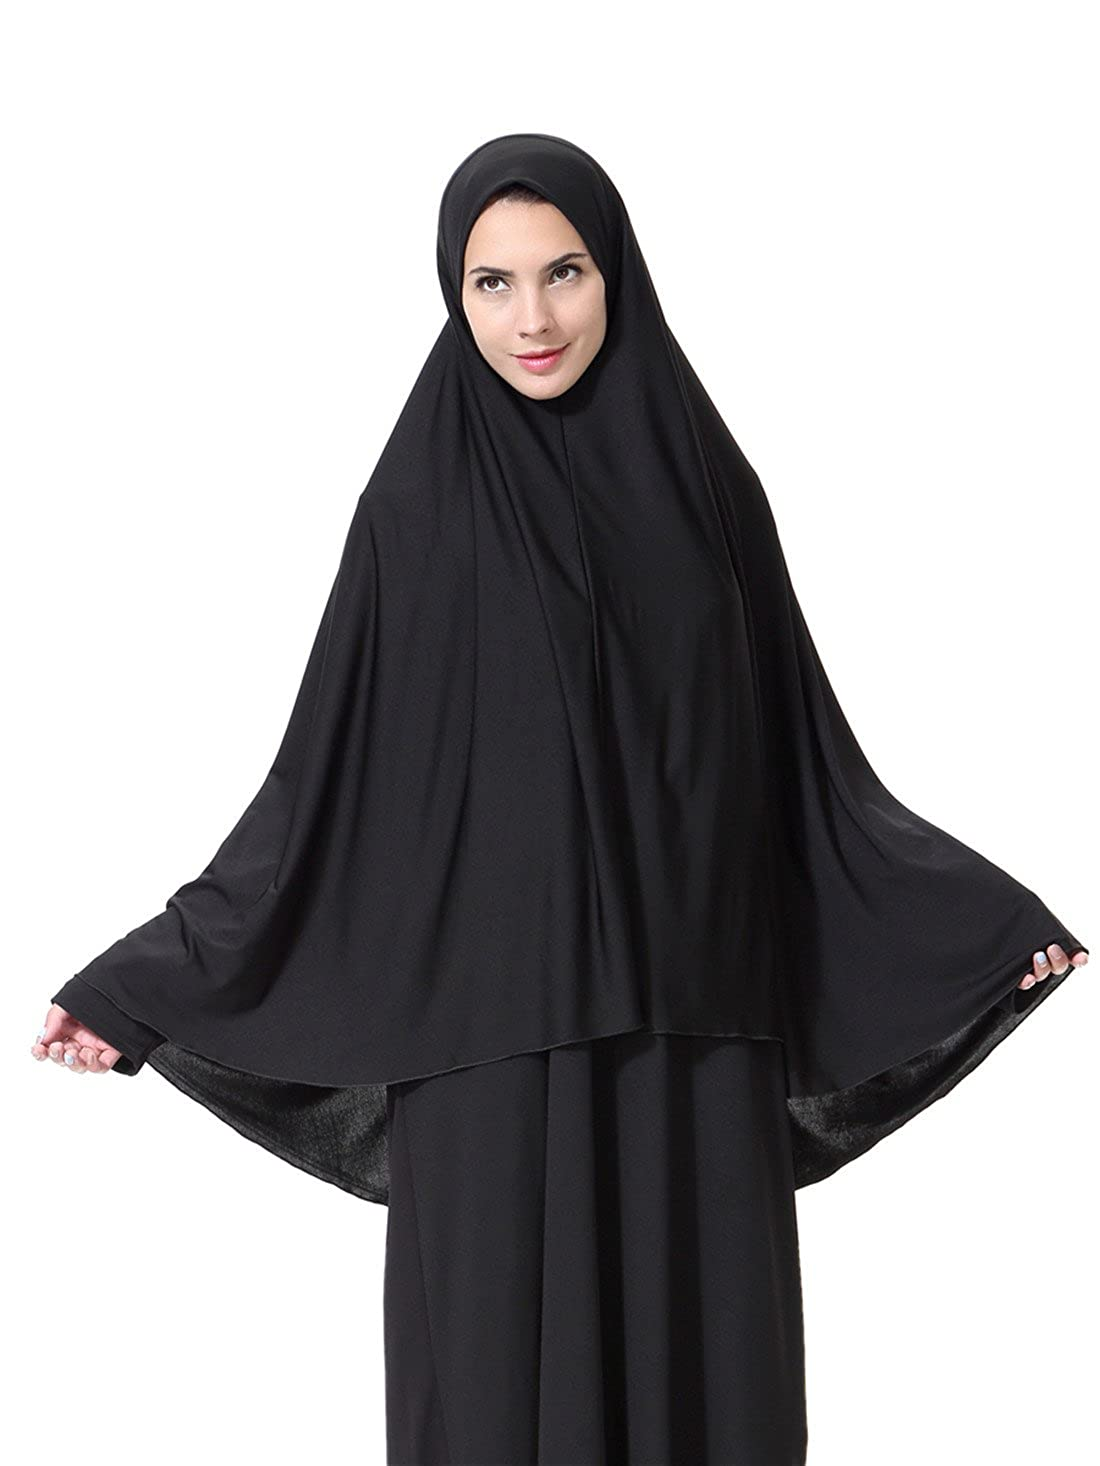 GladThink Mujeres musulmanas estilo largo Hijab Negro XL MSL-HS109-XL